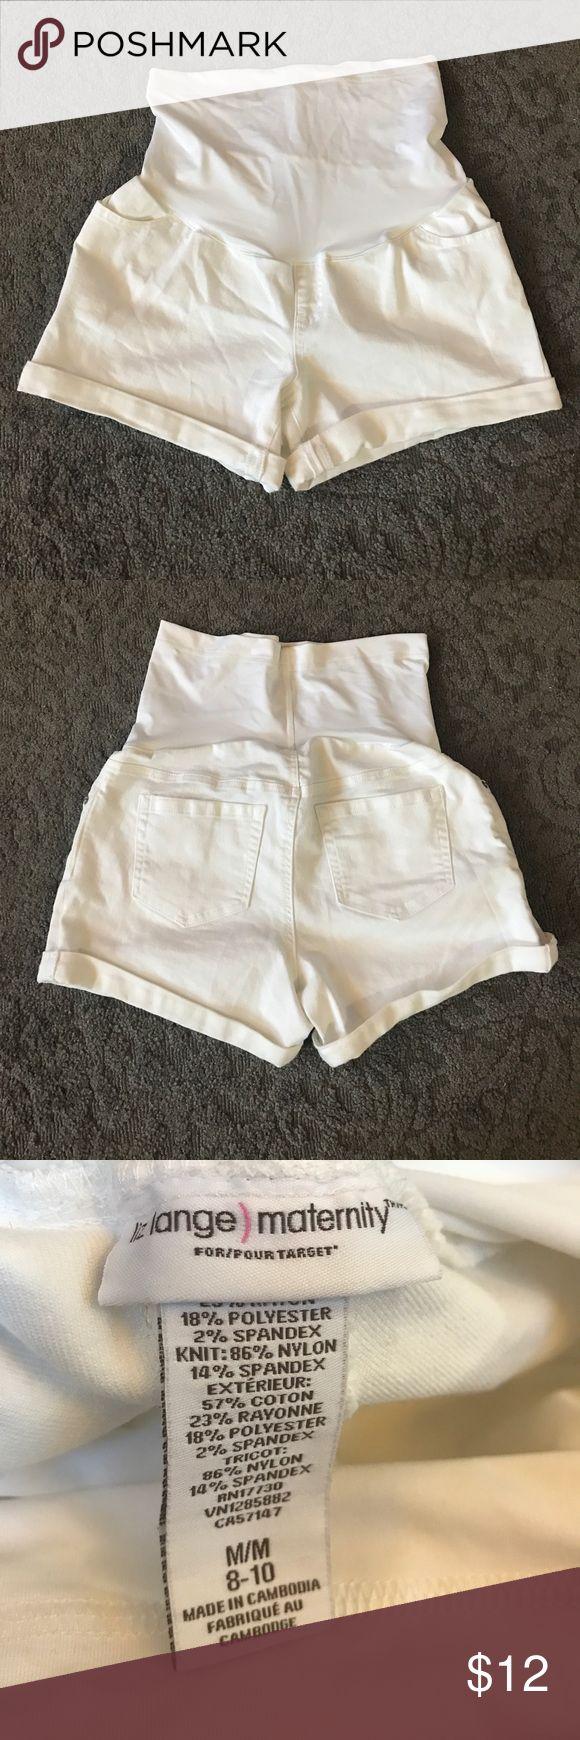 Liz Lange Maternity Shorts White Women's maternity shorts. Worn once size M (8/10) Liz Lange for Target Shorts Jean Shorts